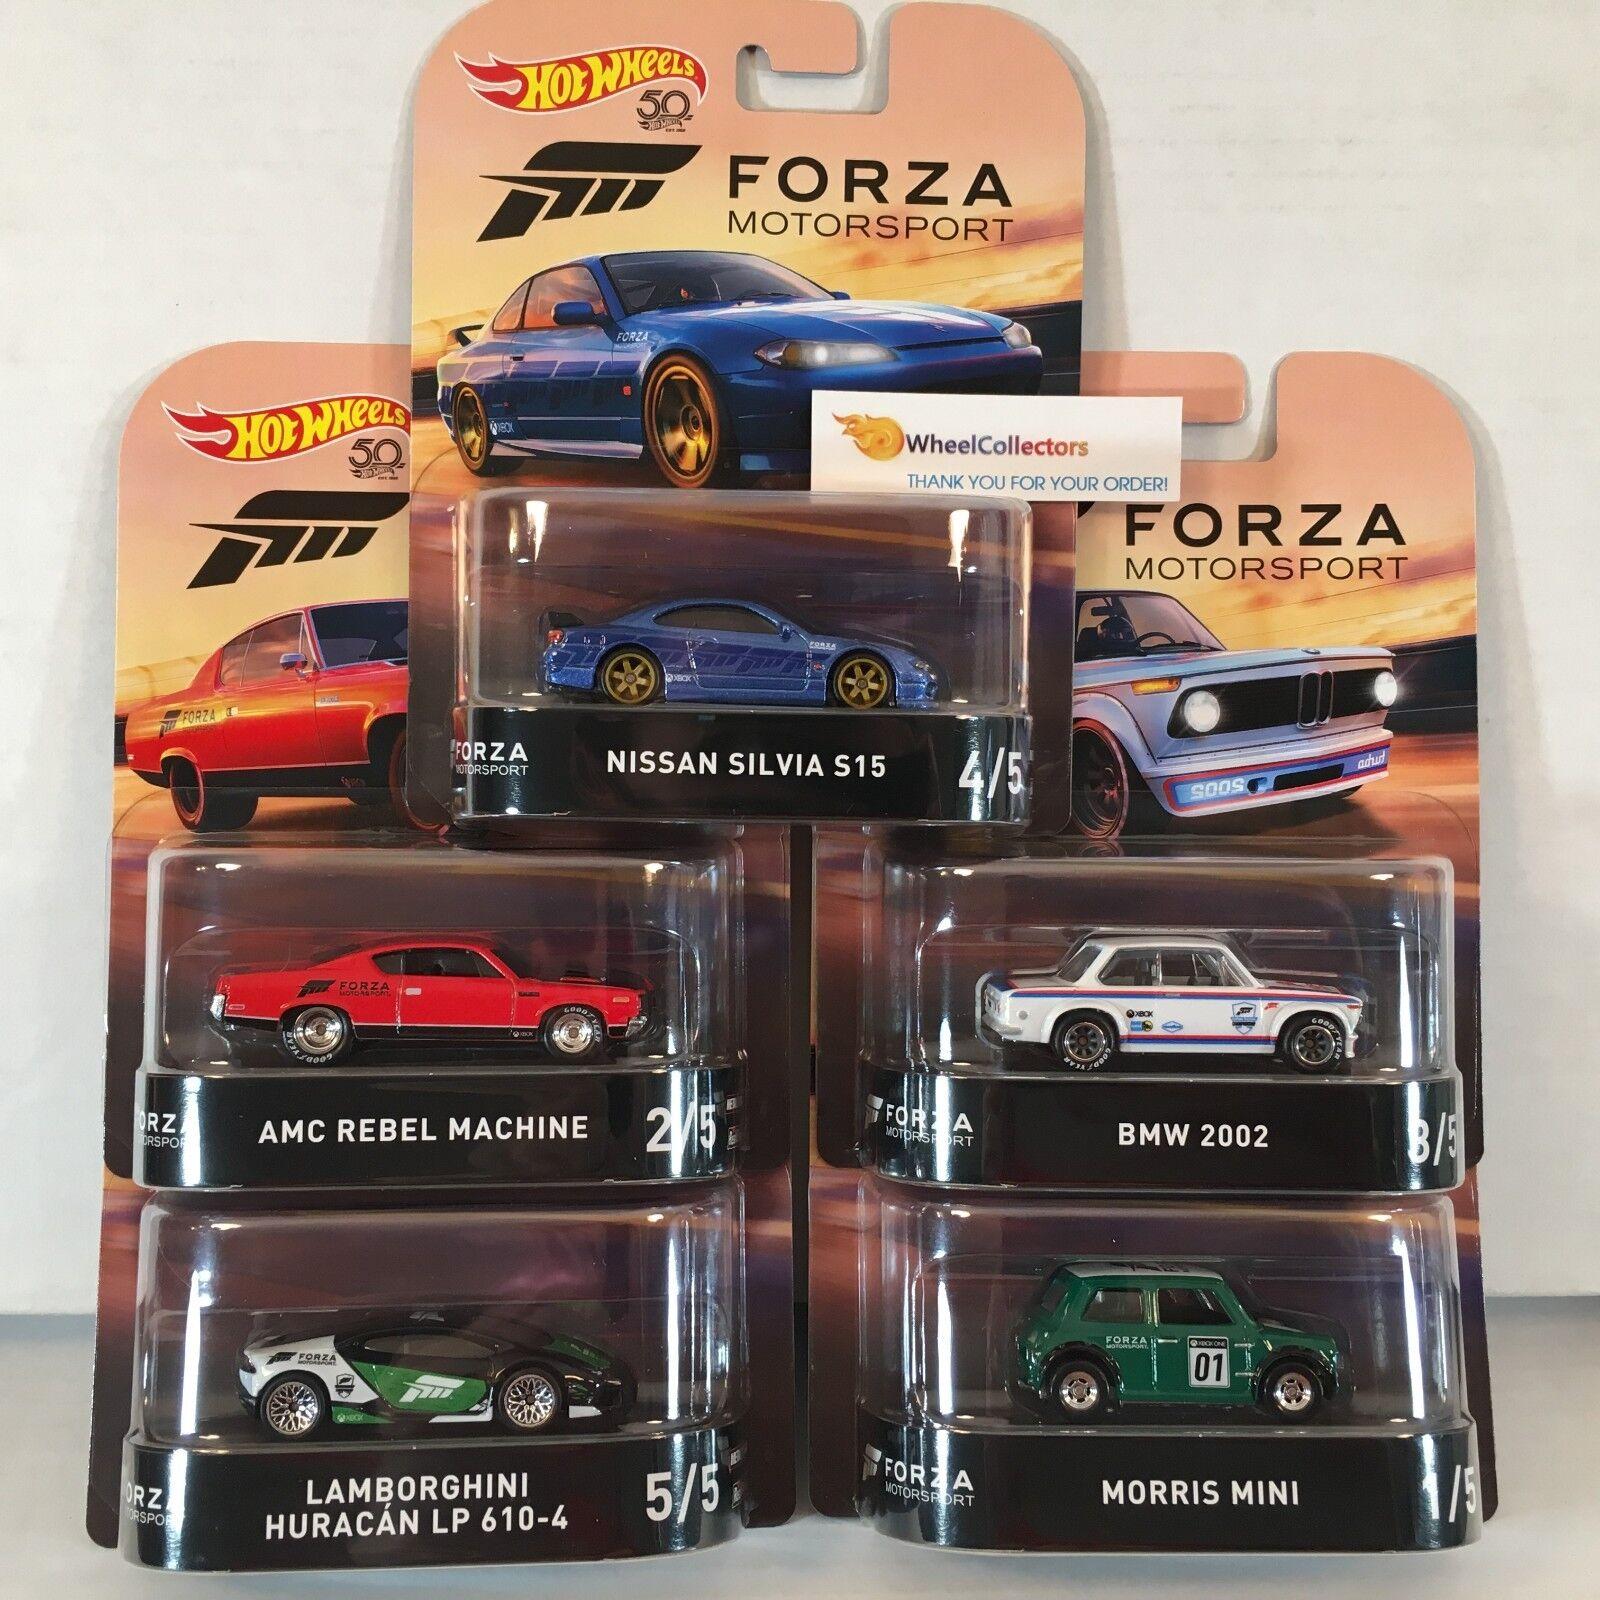 5 Car Set New!  * 2018 Hot Wheels Retro FORZA Case J w/ Silvia * IN STOCK